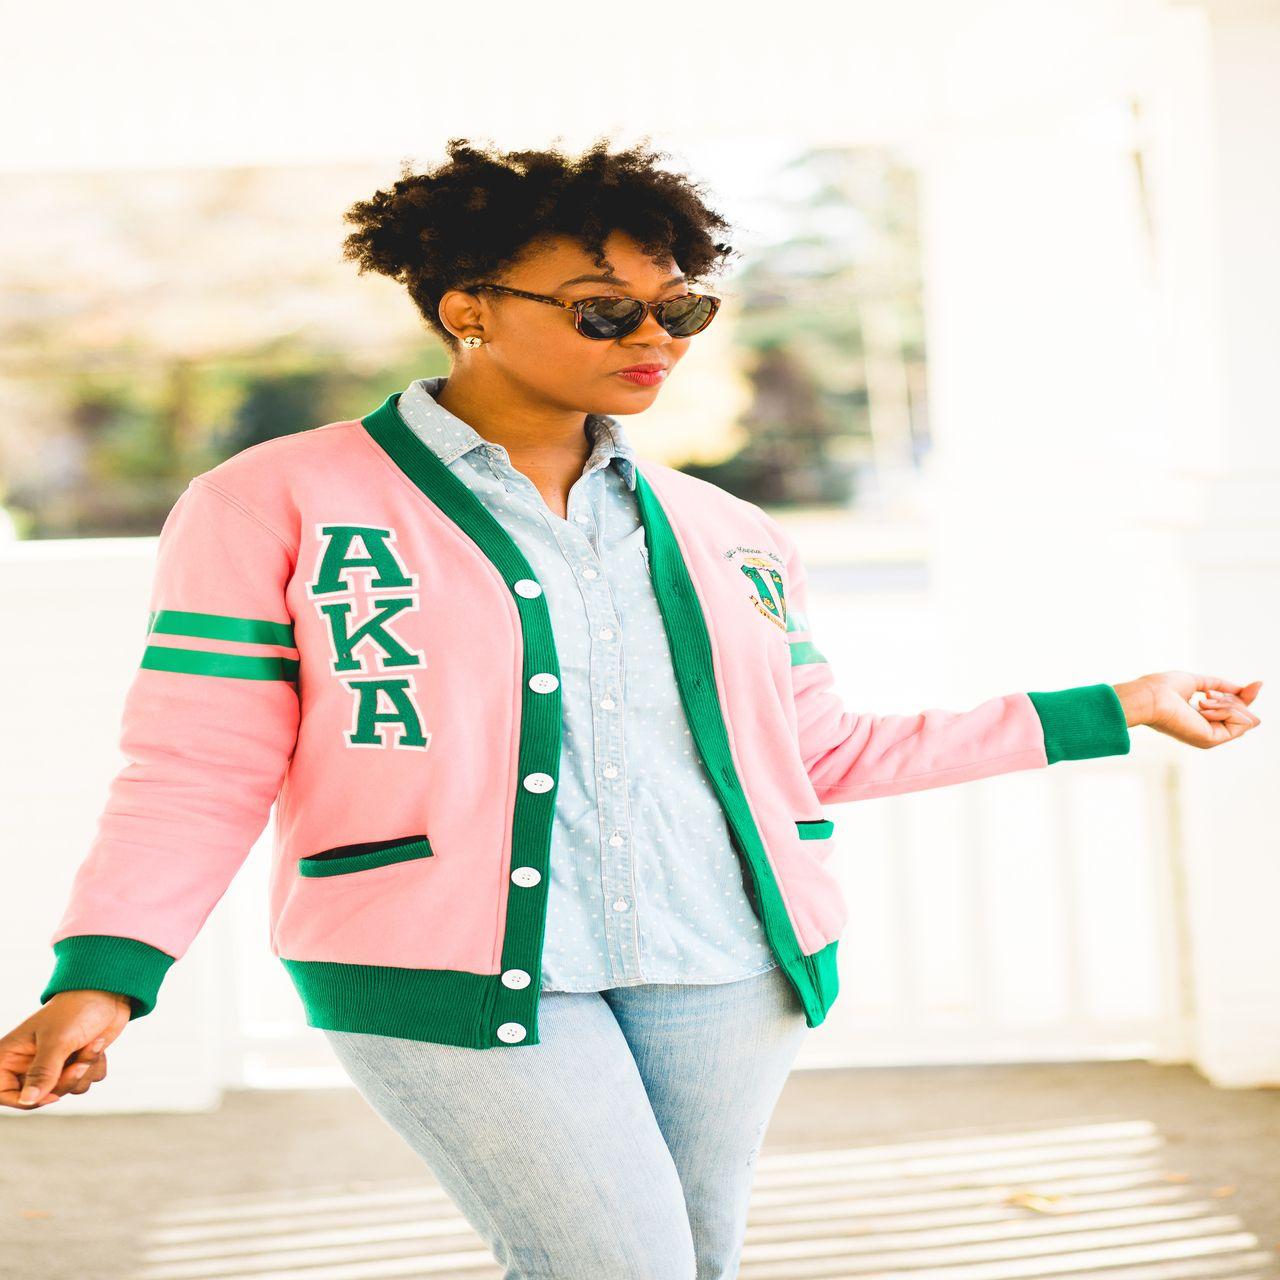 Pink & Green Cardigan | Fashionably Greek | AKA | Pinterest ...